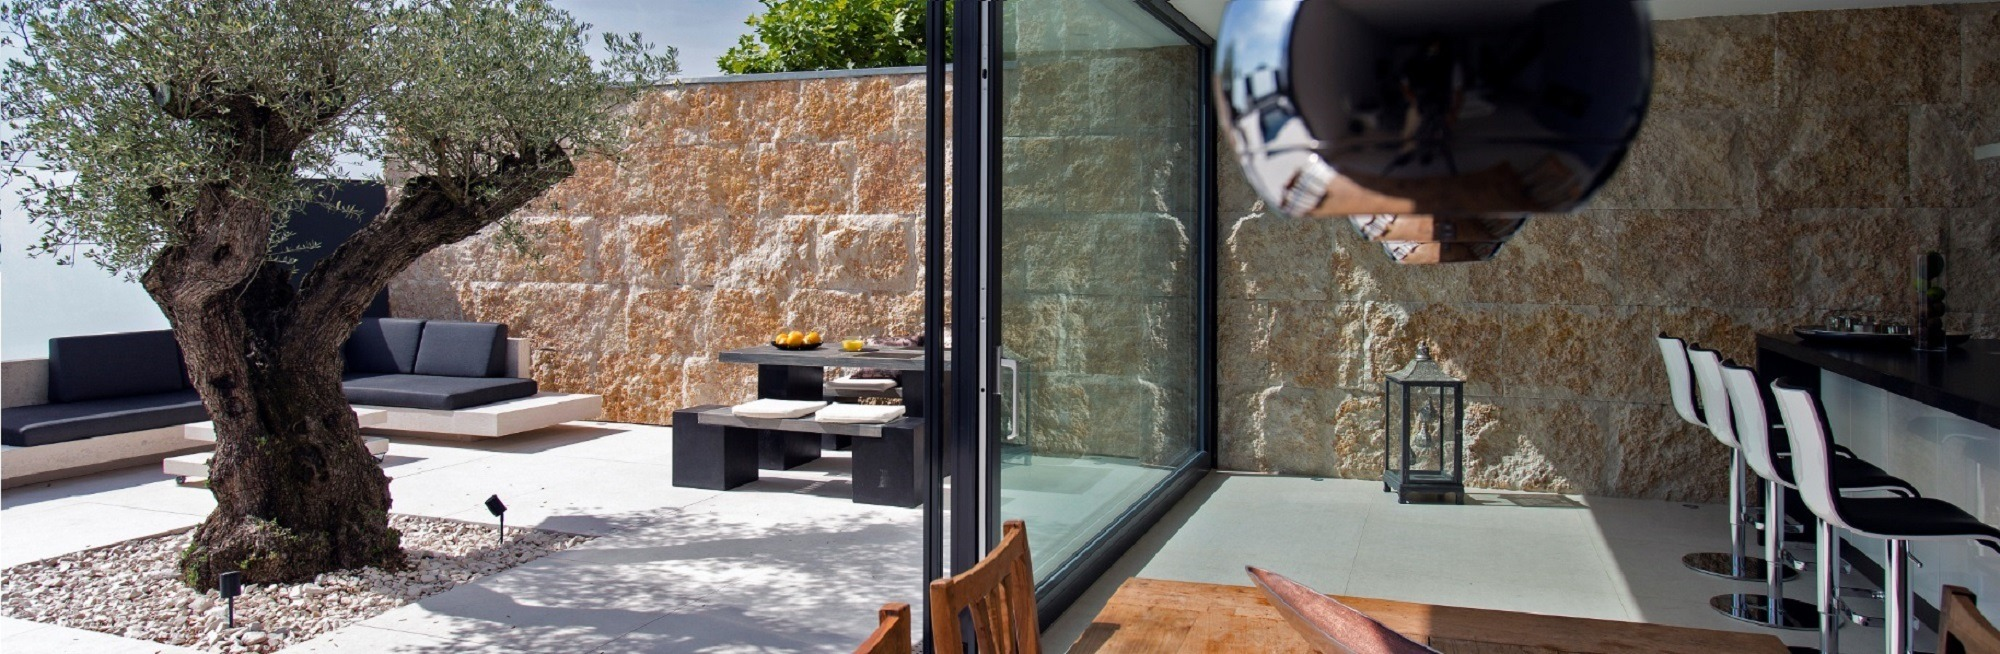 Pool garten stone4you naturstein granit marmor for Garten pool 457x122